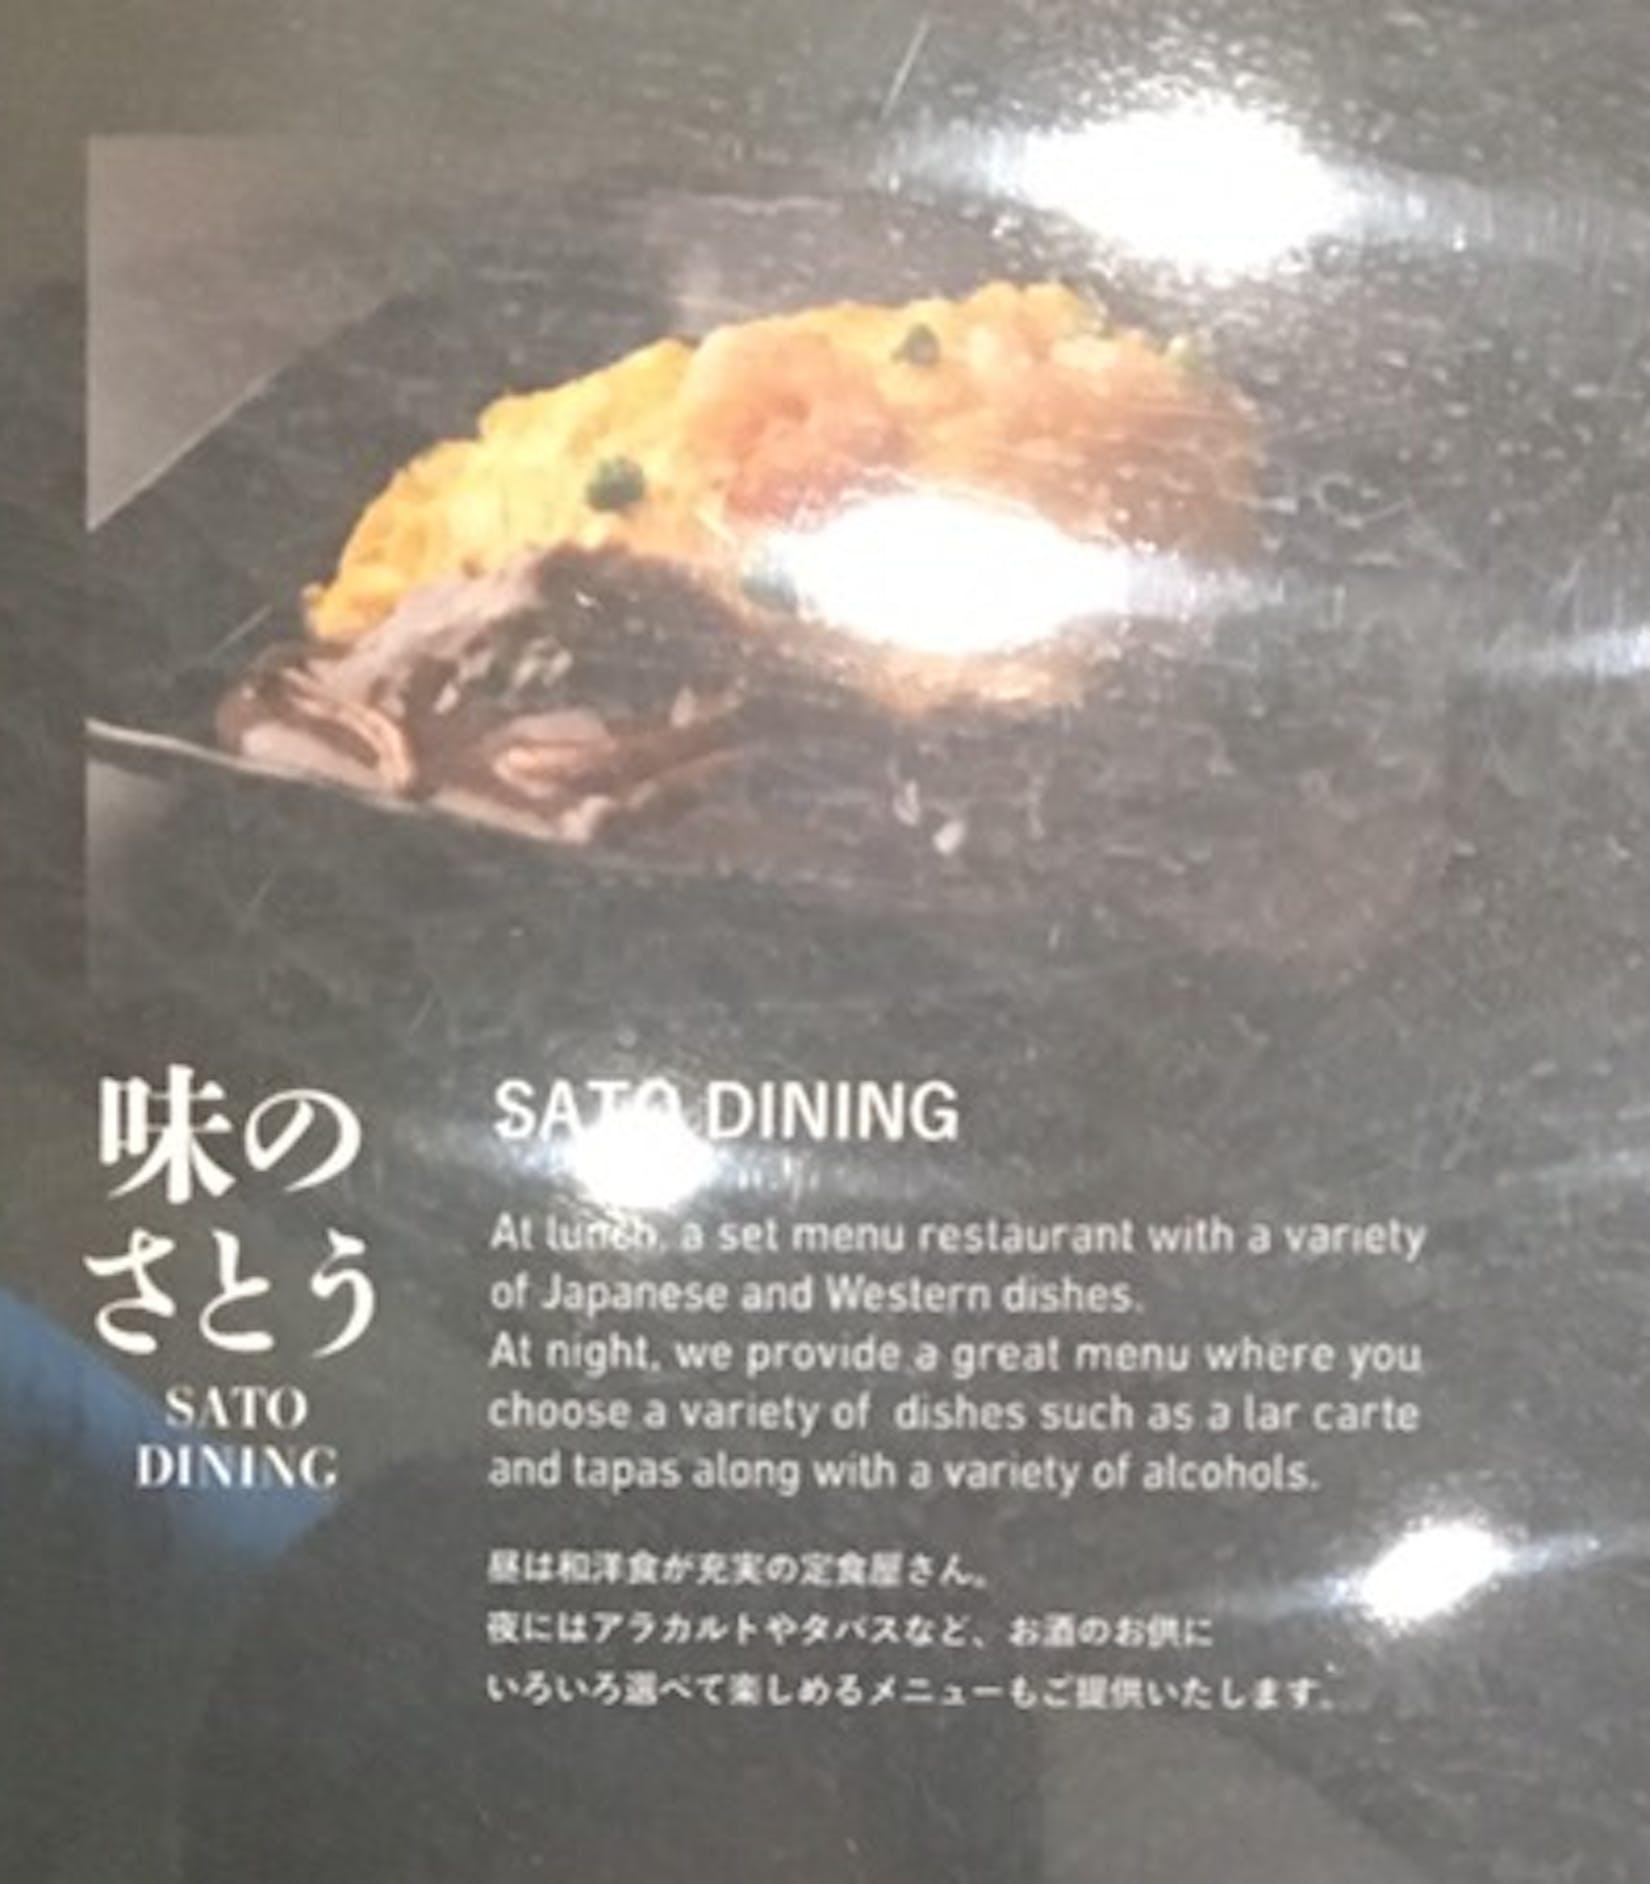 SATO DINING | yathar